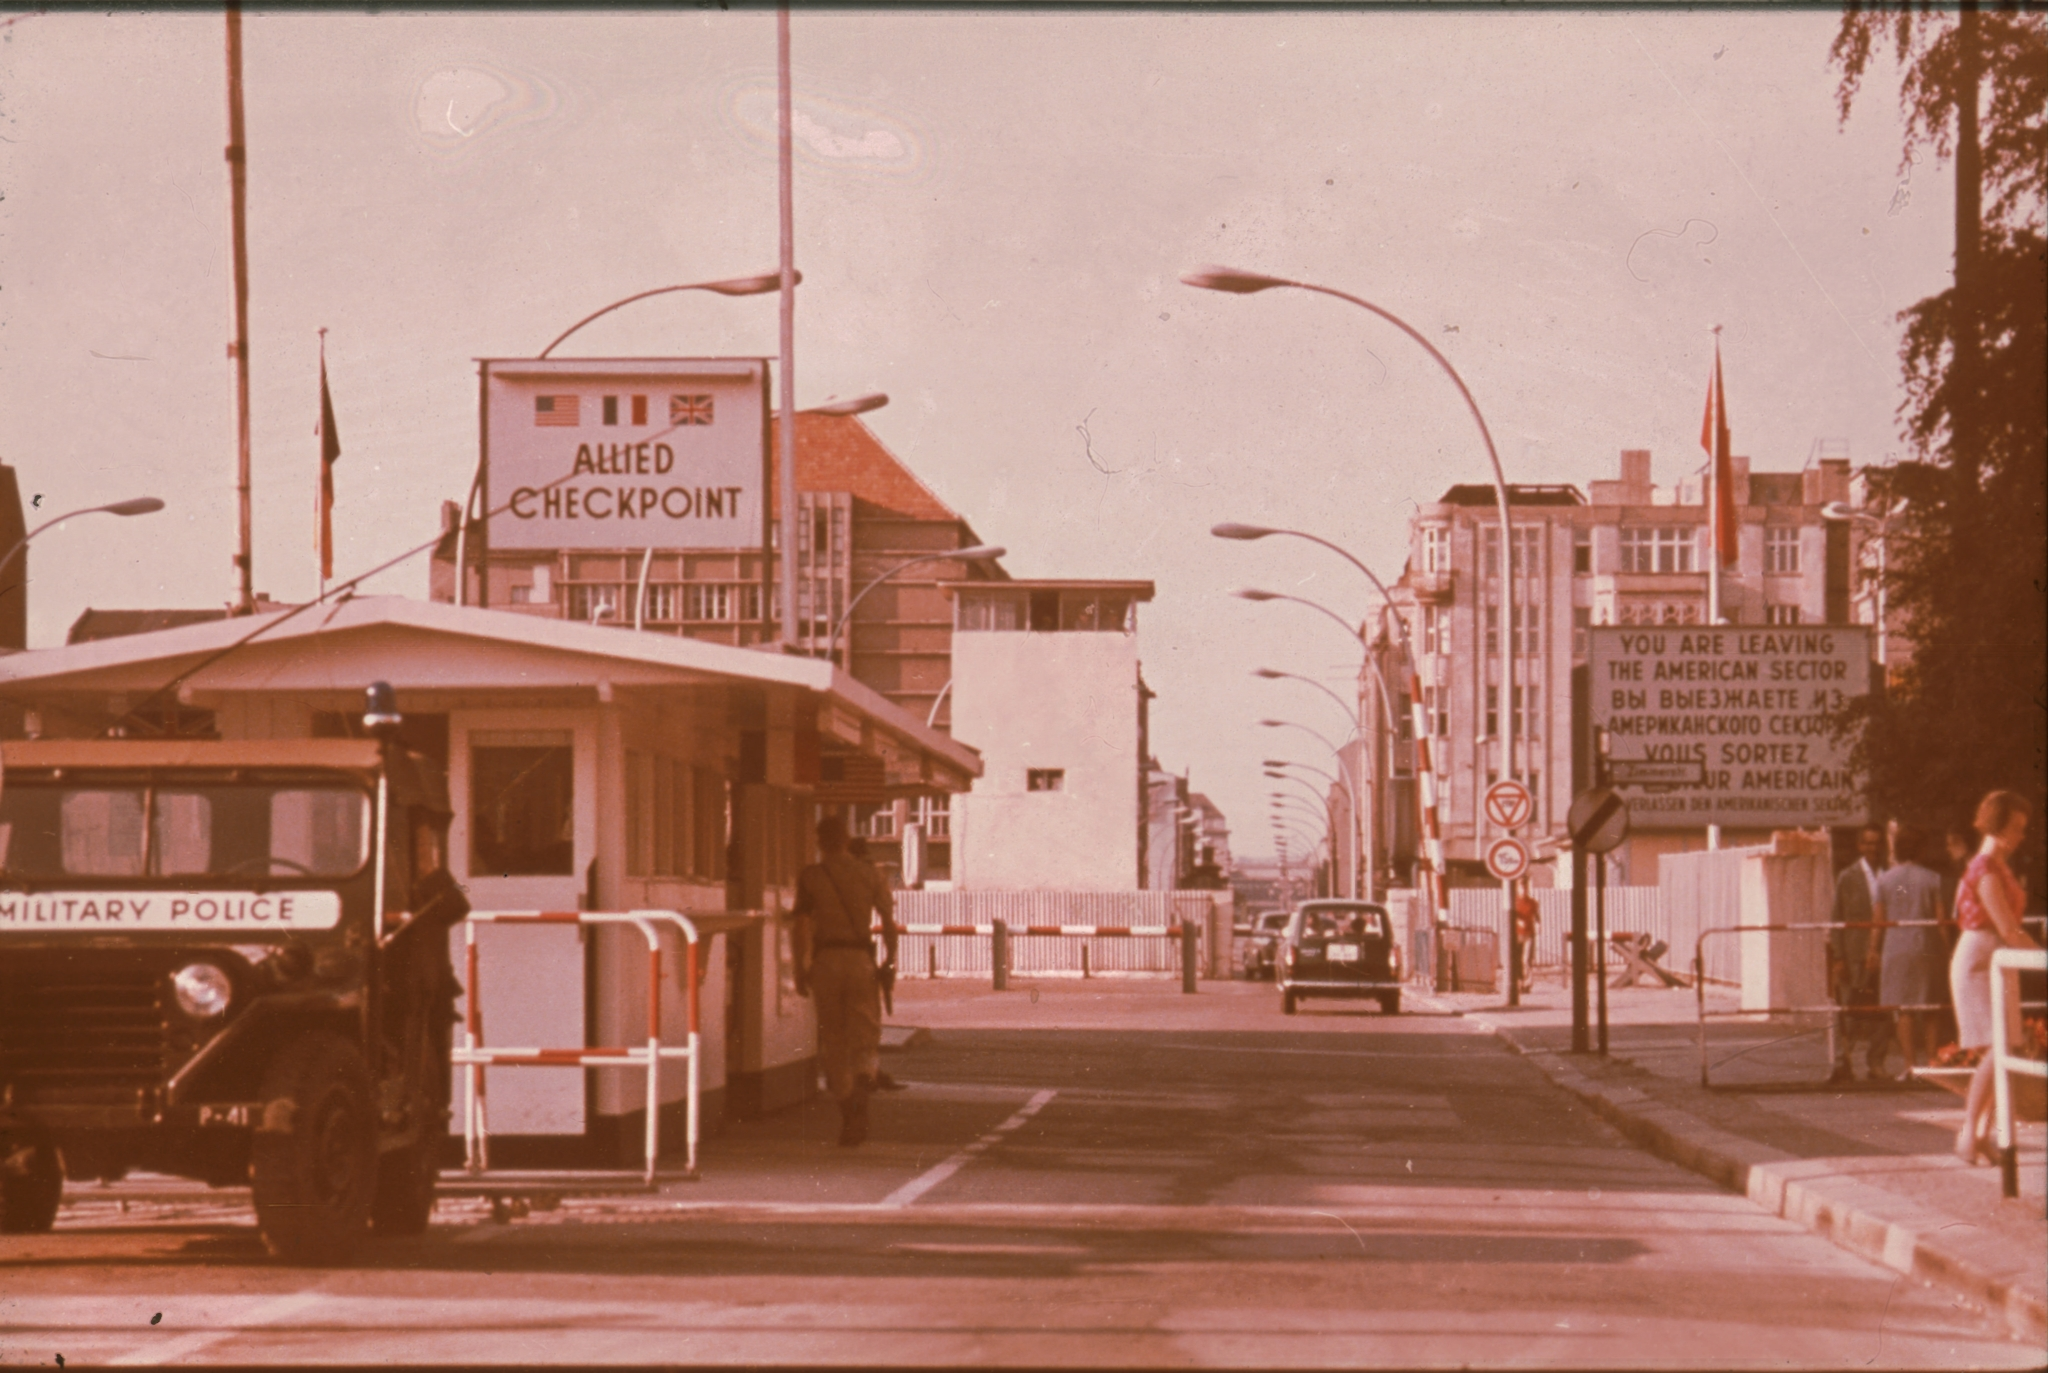 Die Berliner Mauer um 1973 - Berlin Wall - Daniel Rohde-Kage 50